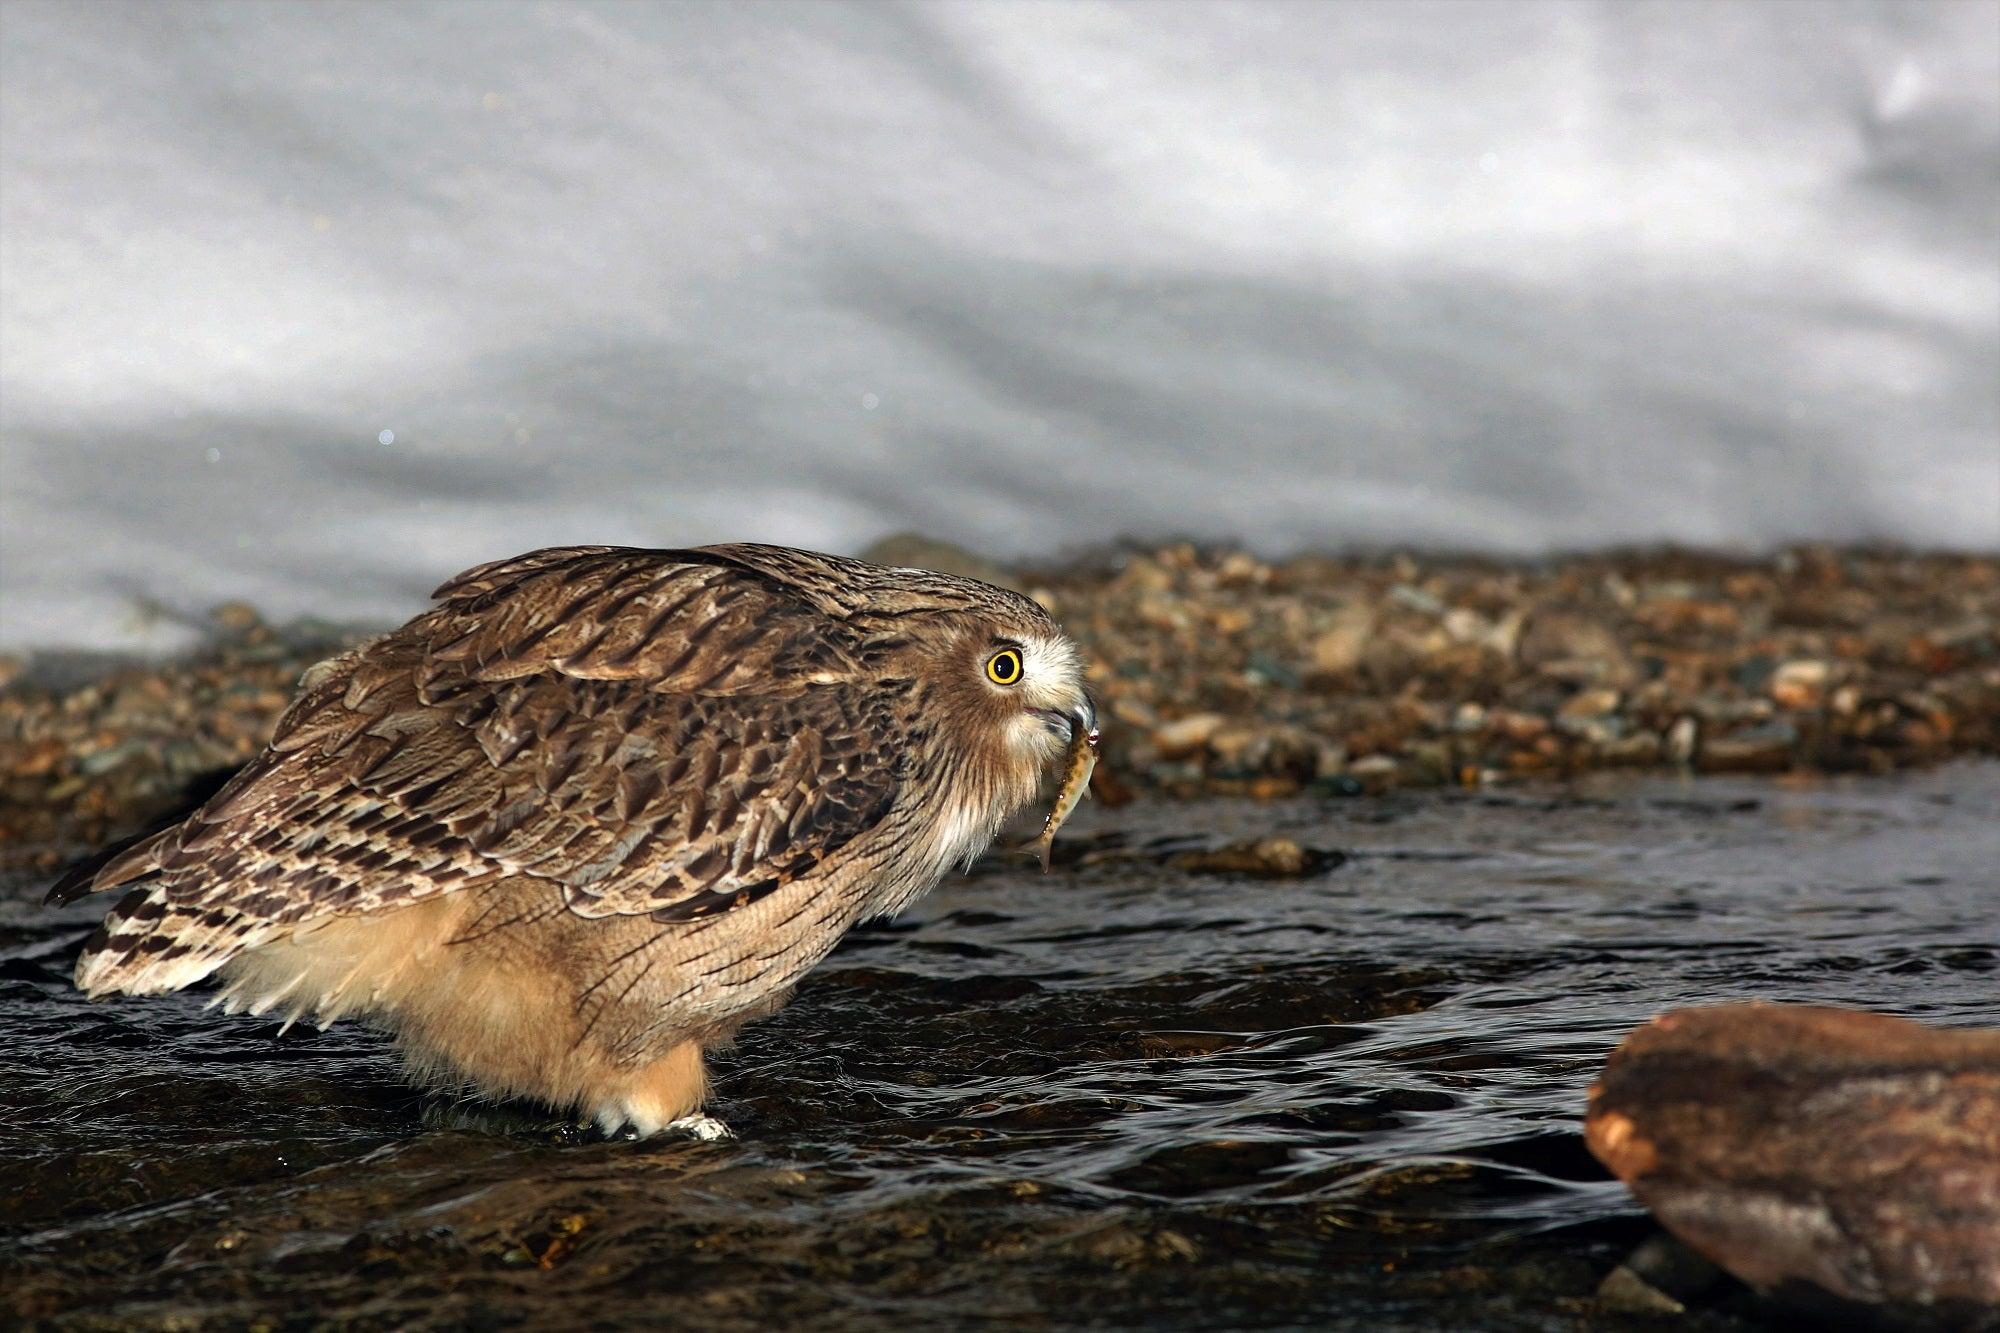 A Blakiston's fish owl hunting for masu salmon in a river